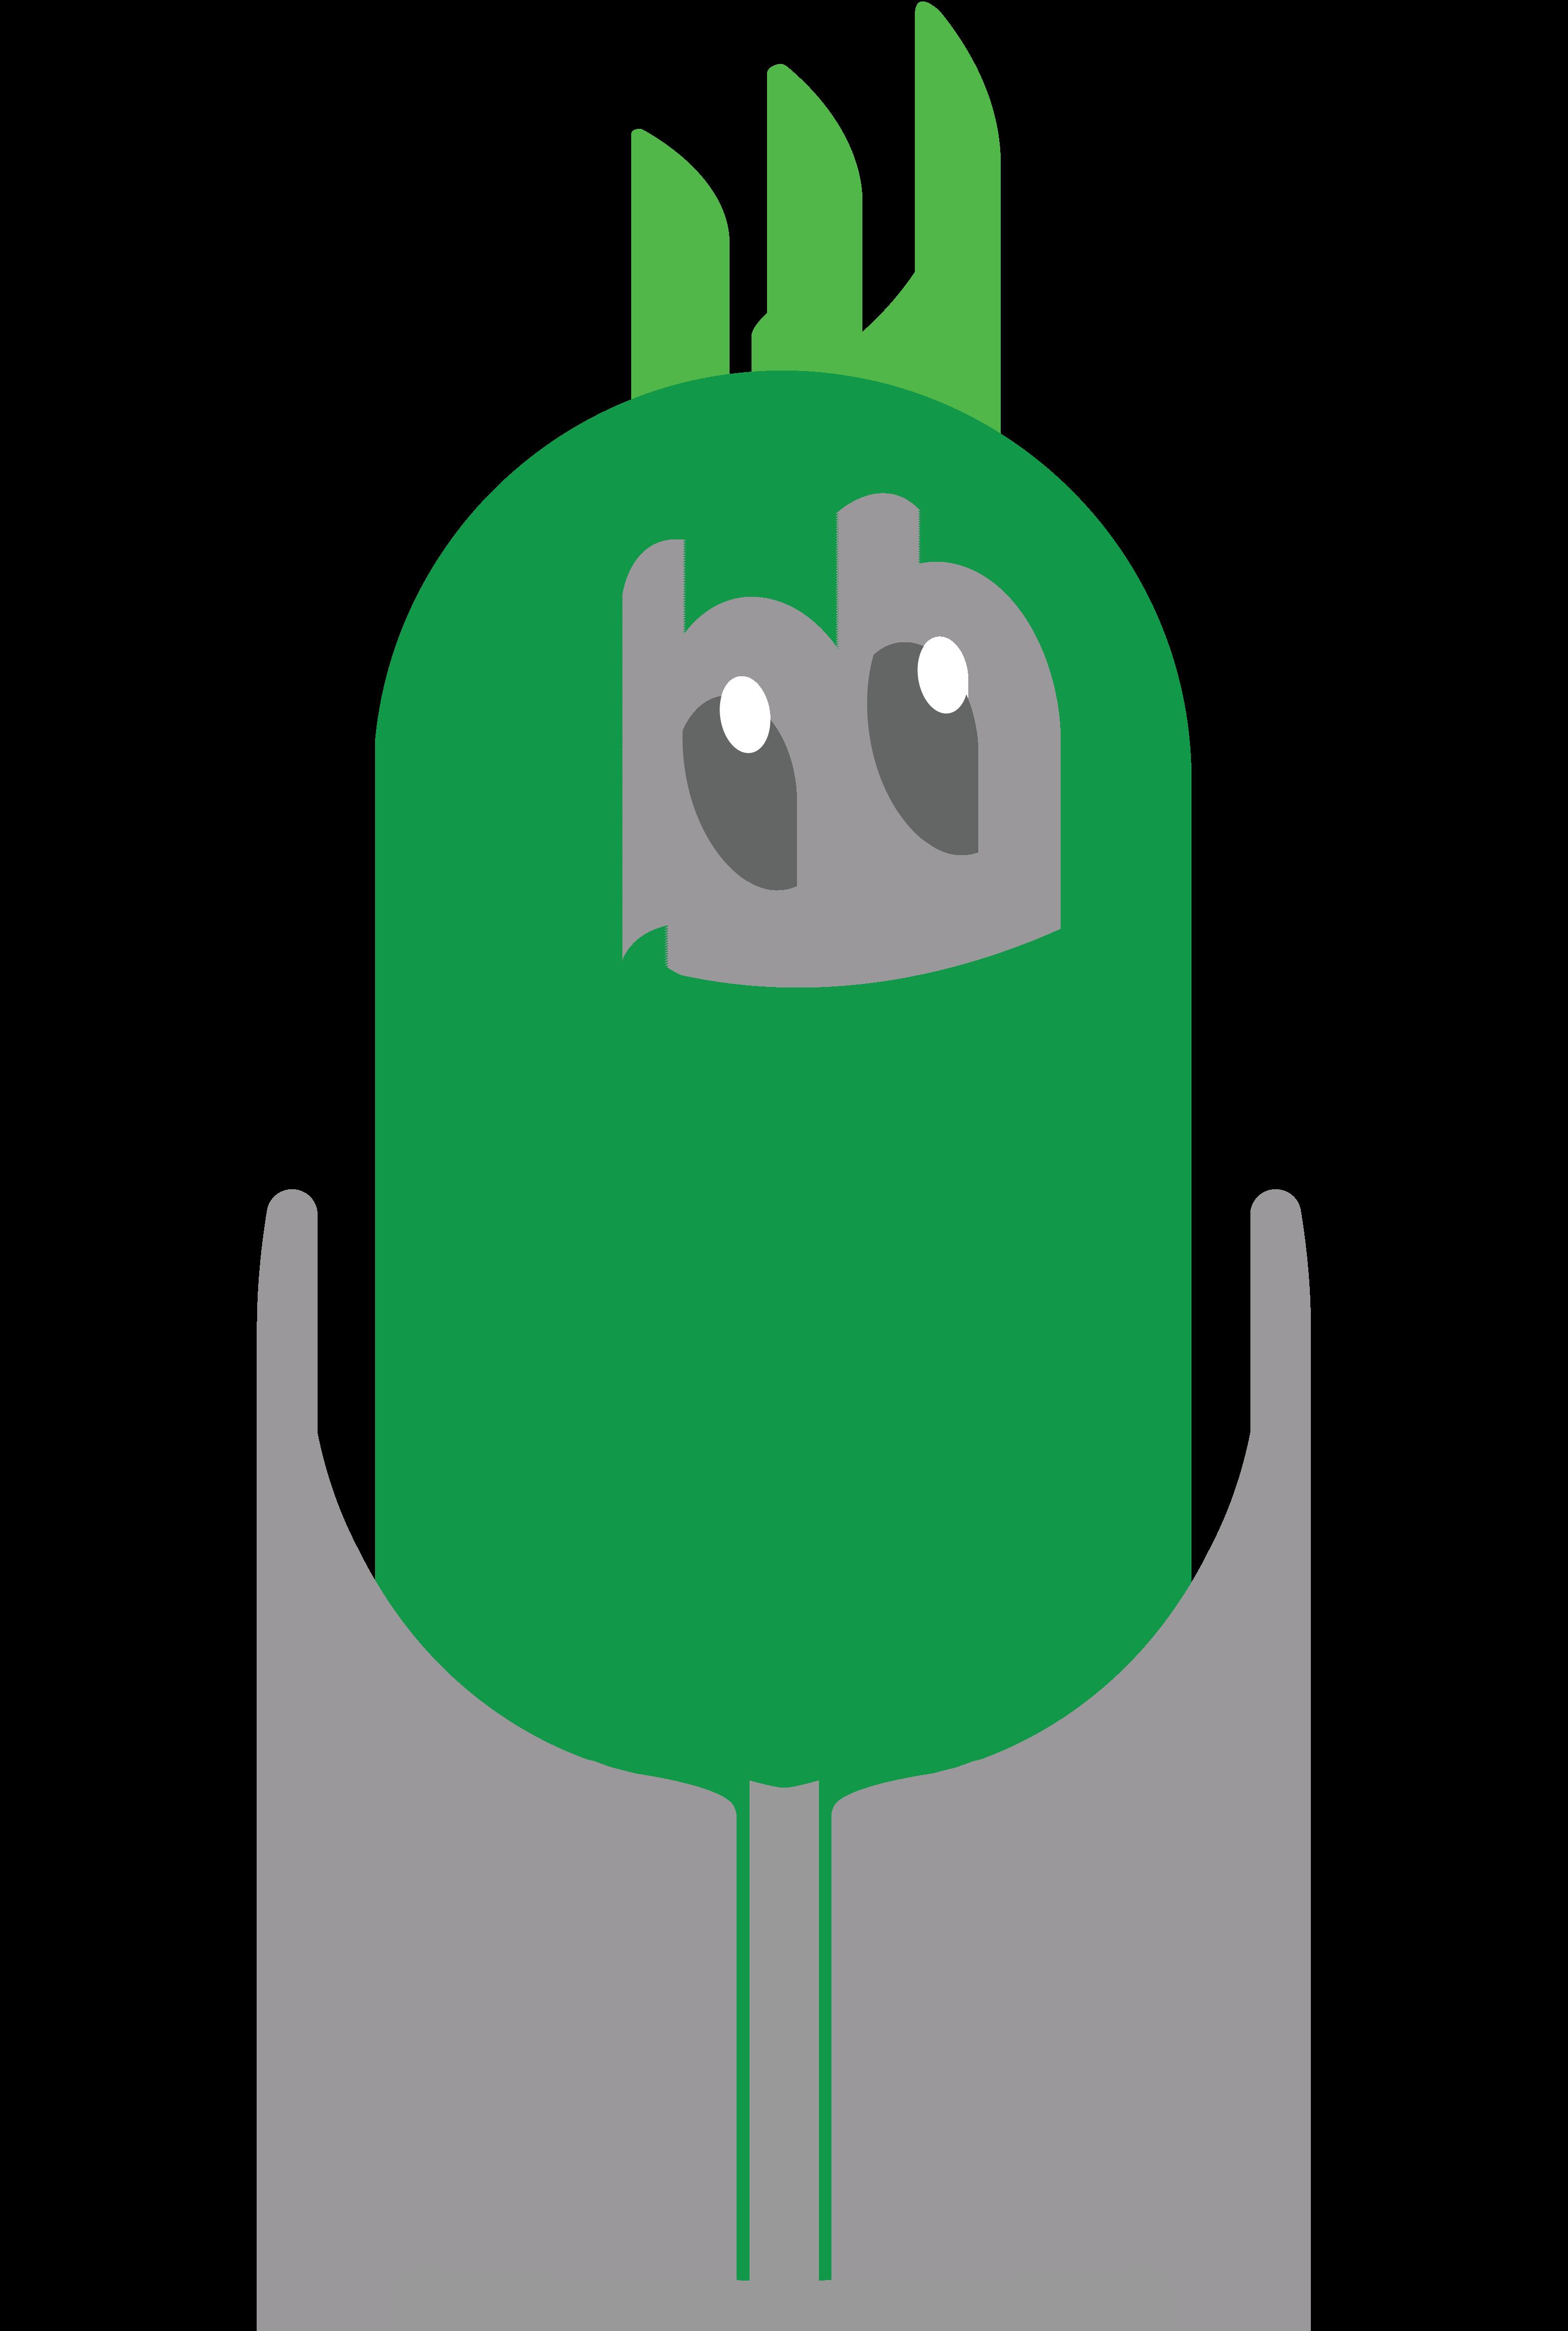 logo di speaky facile